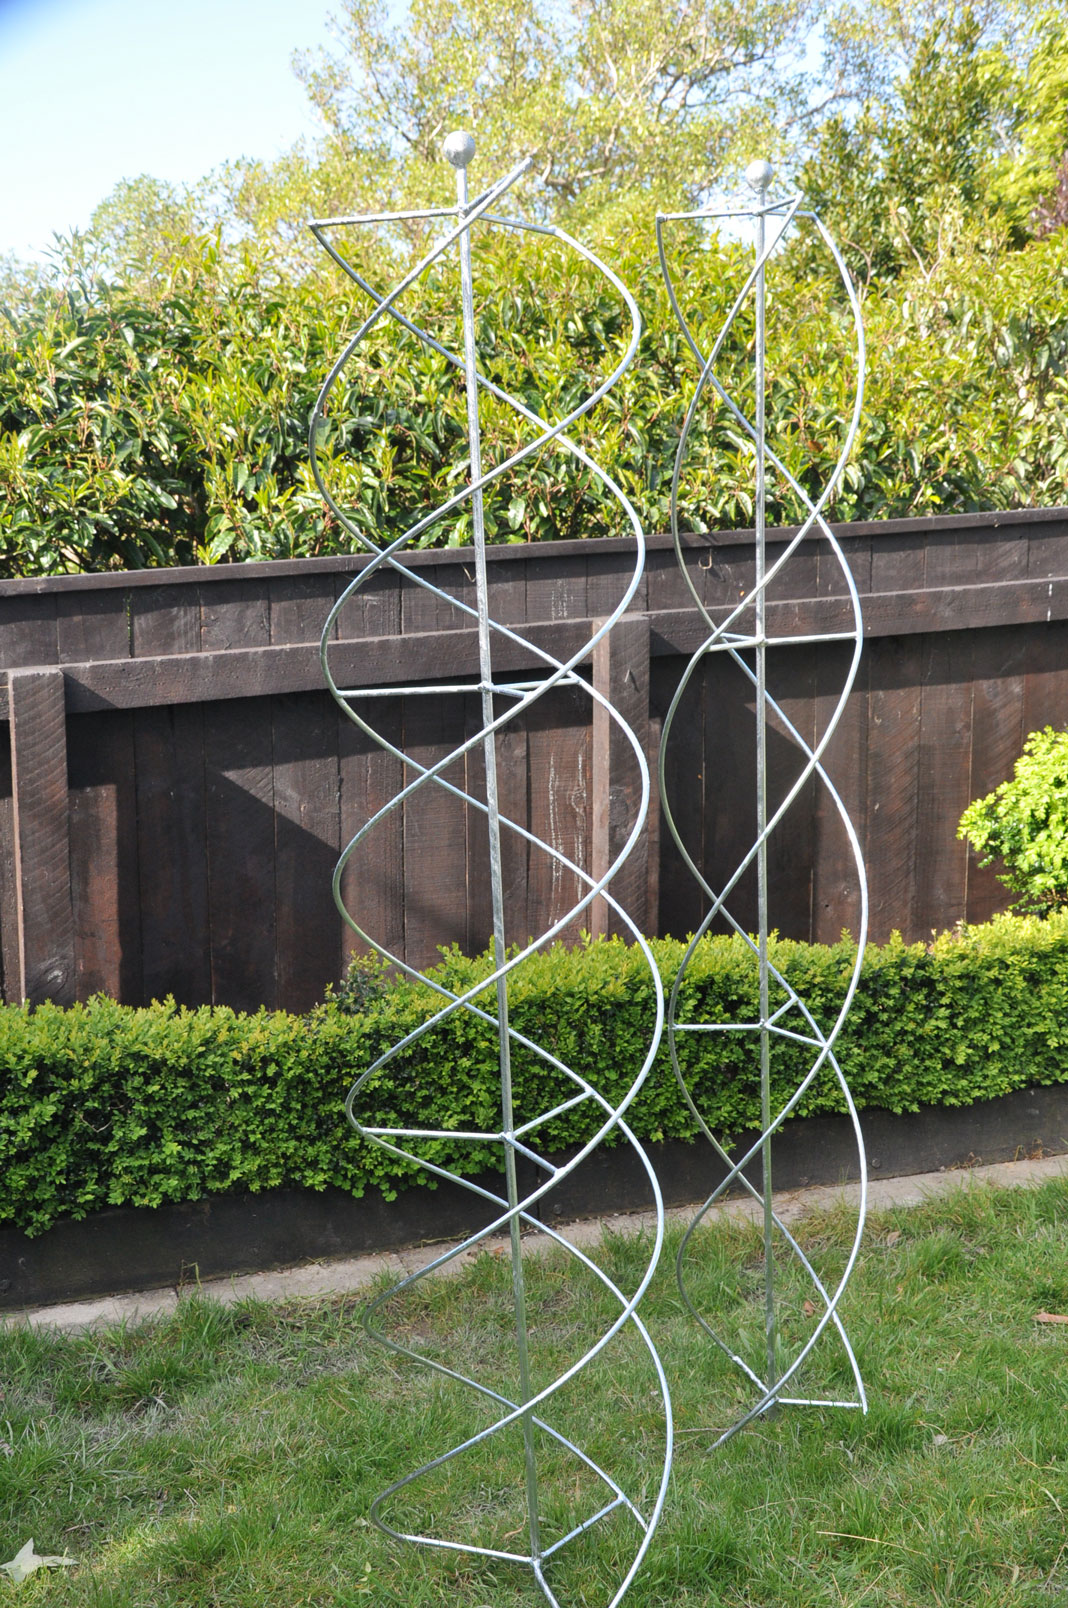 Spiral column designed by Mosaicdesi